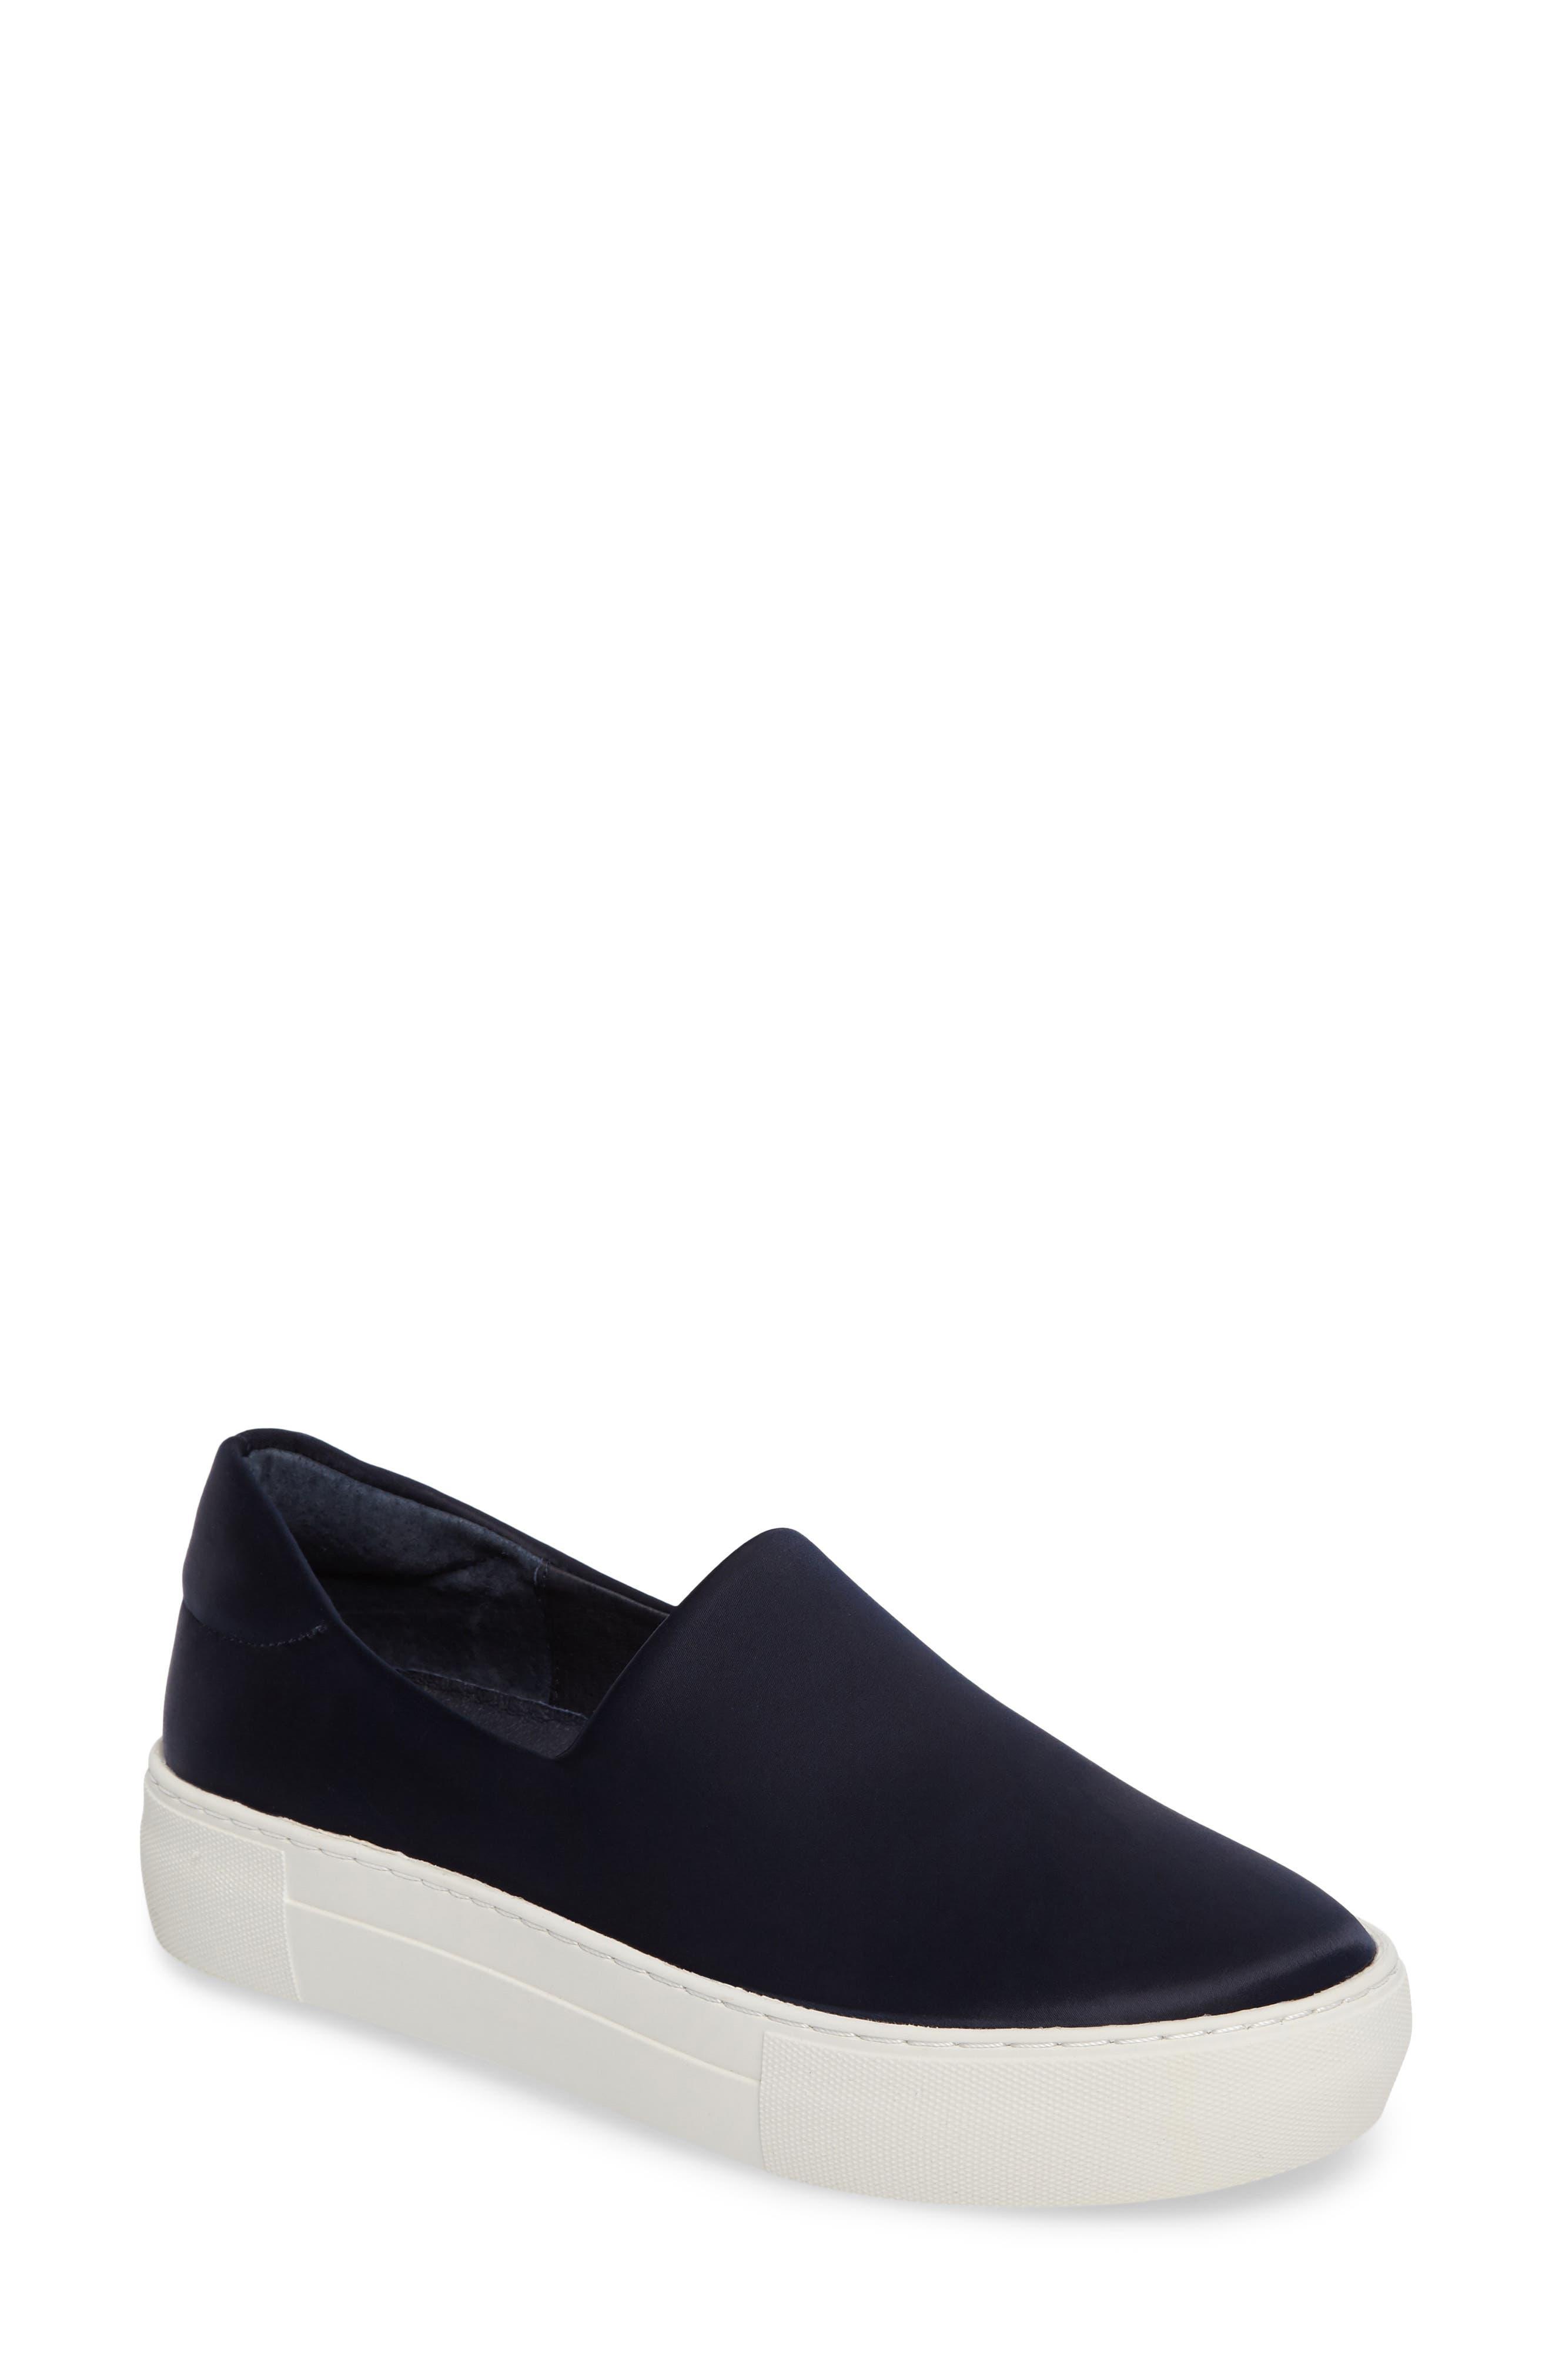 Main Image - JSlides Abba Slip-On Platform Sneaker (Women)